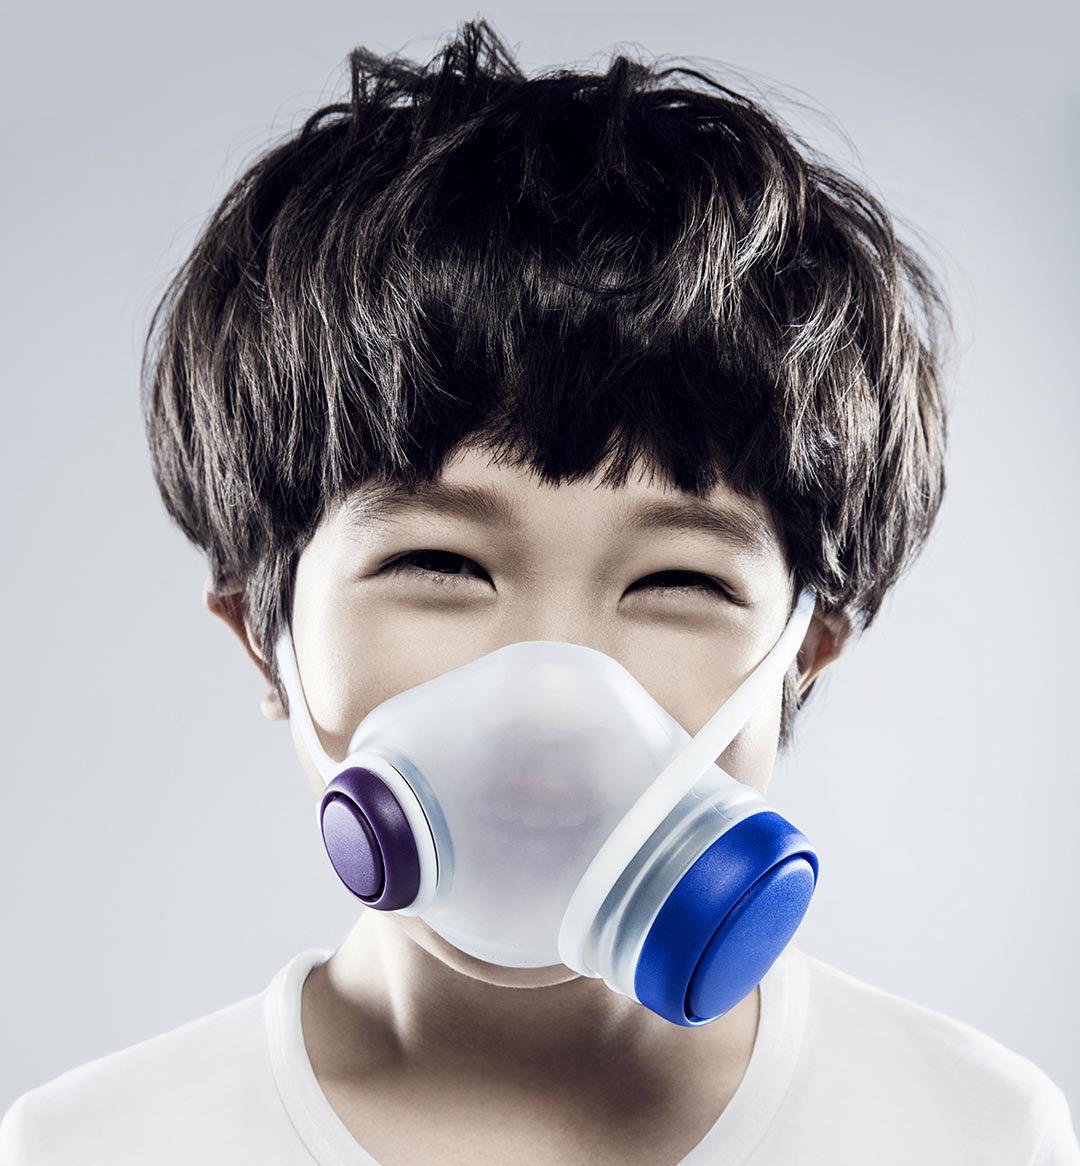 Original Play Children Anti Pollution Mask Anti Breathing Children Safe Respirators Block Dust PM2.5 Haze Anti Pollution Air